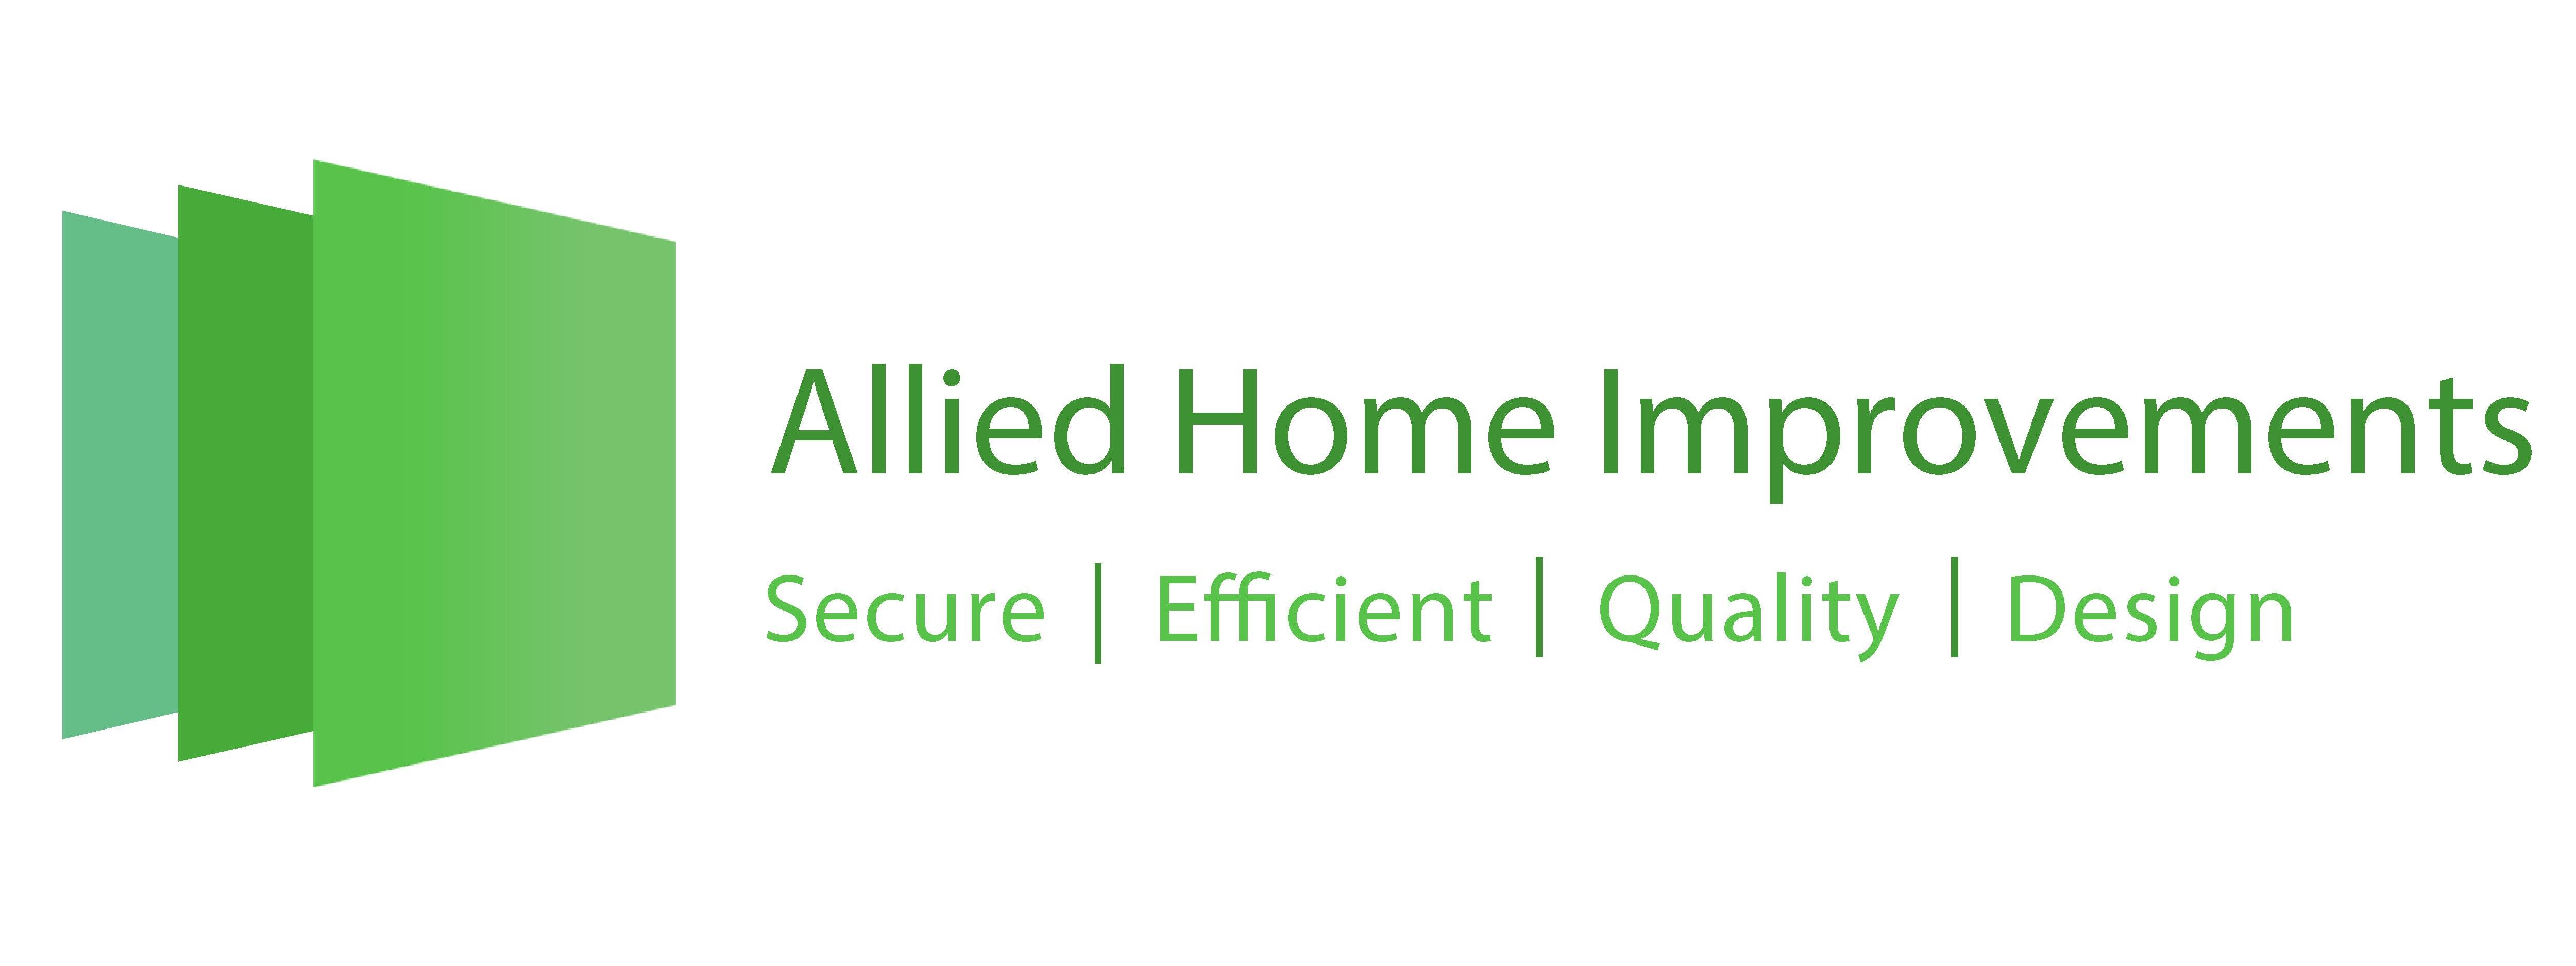 Allied Home Improvements Ltd